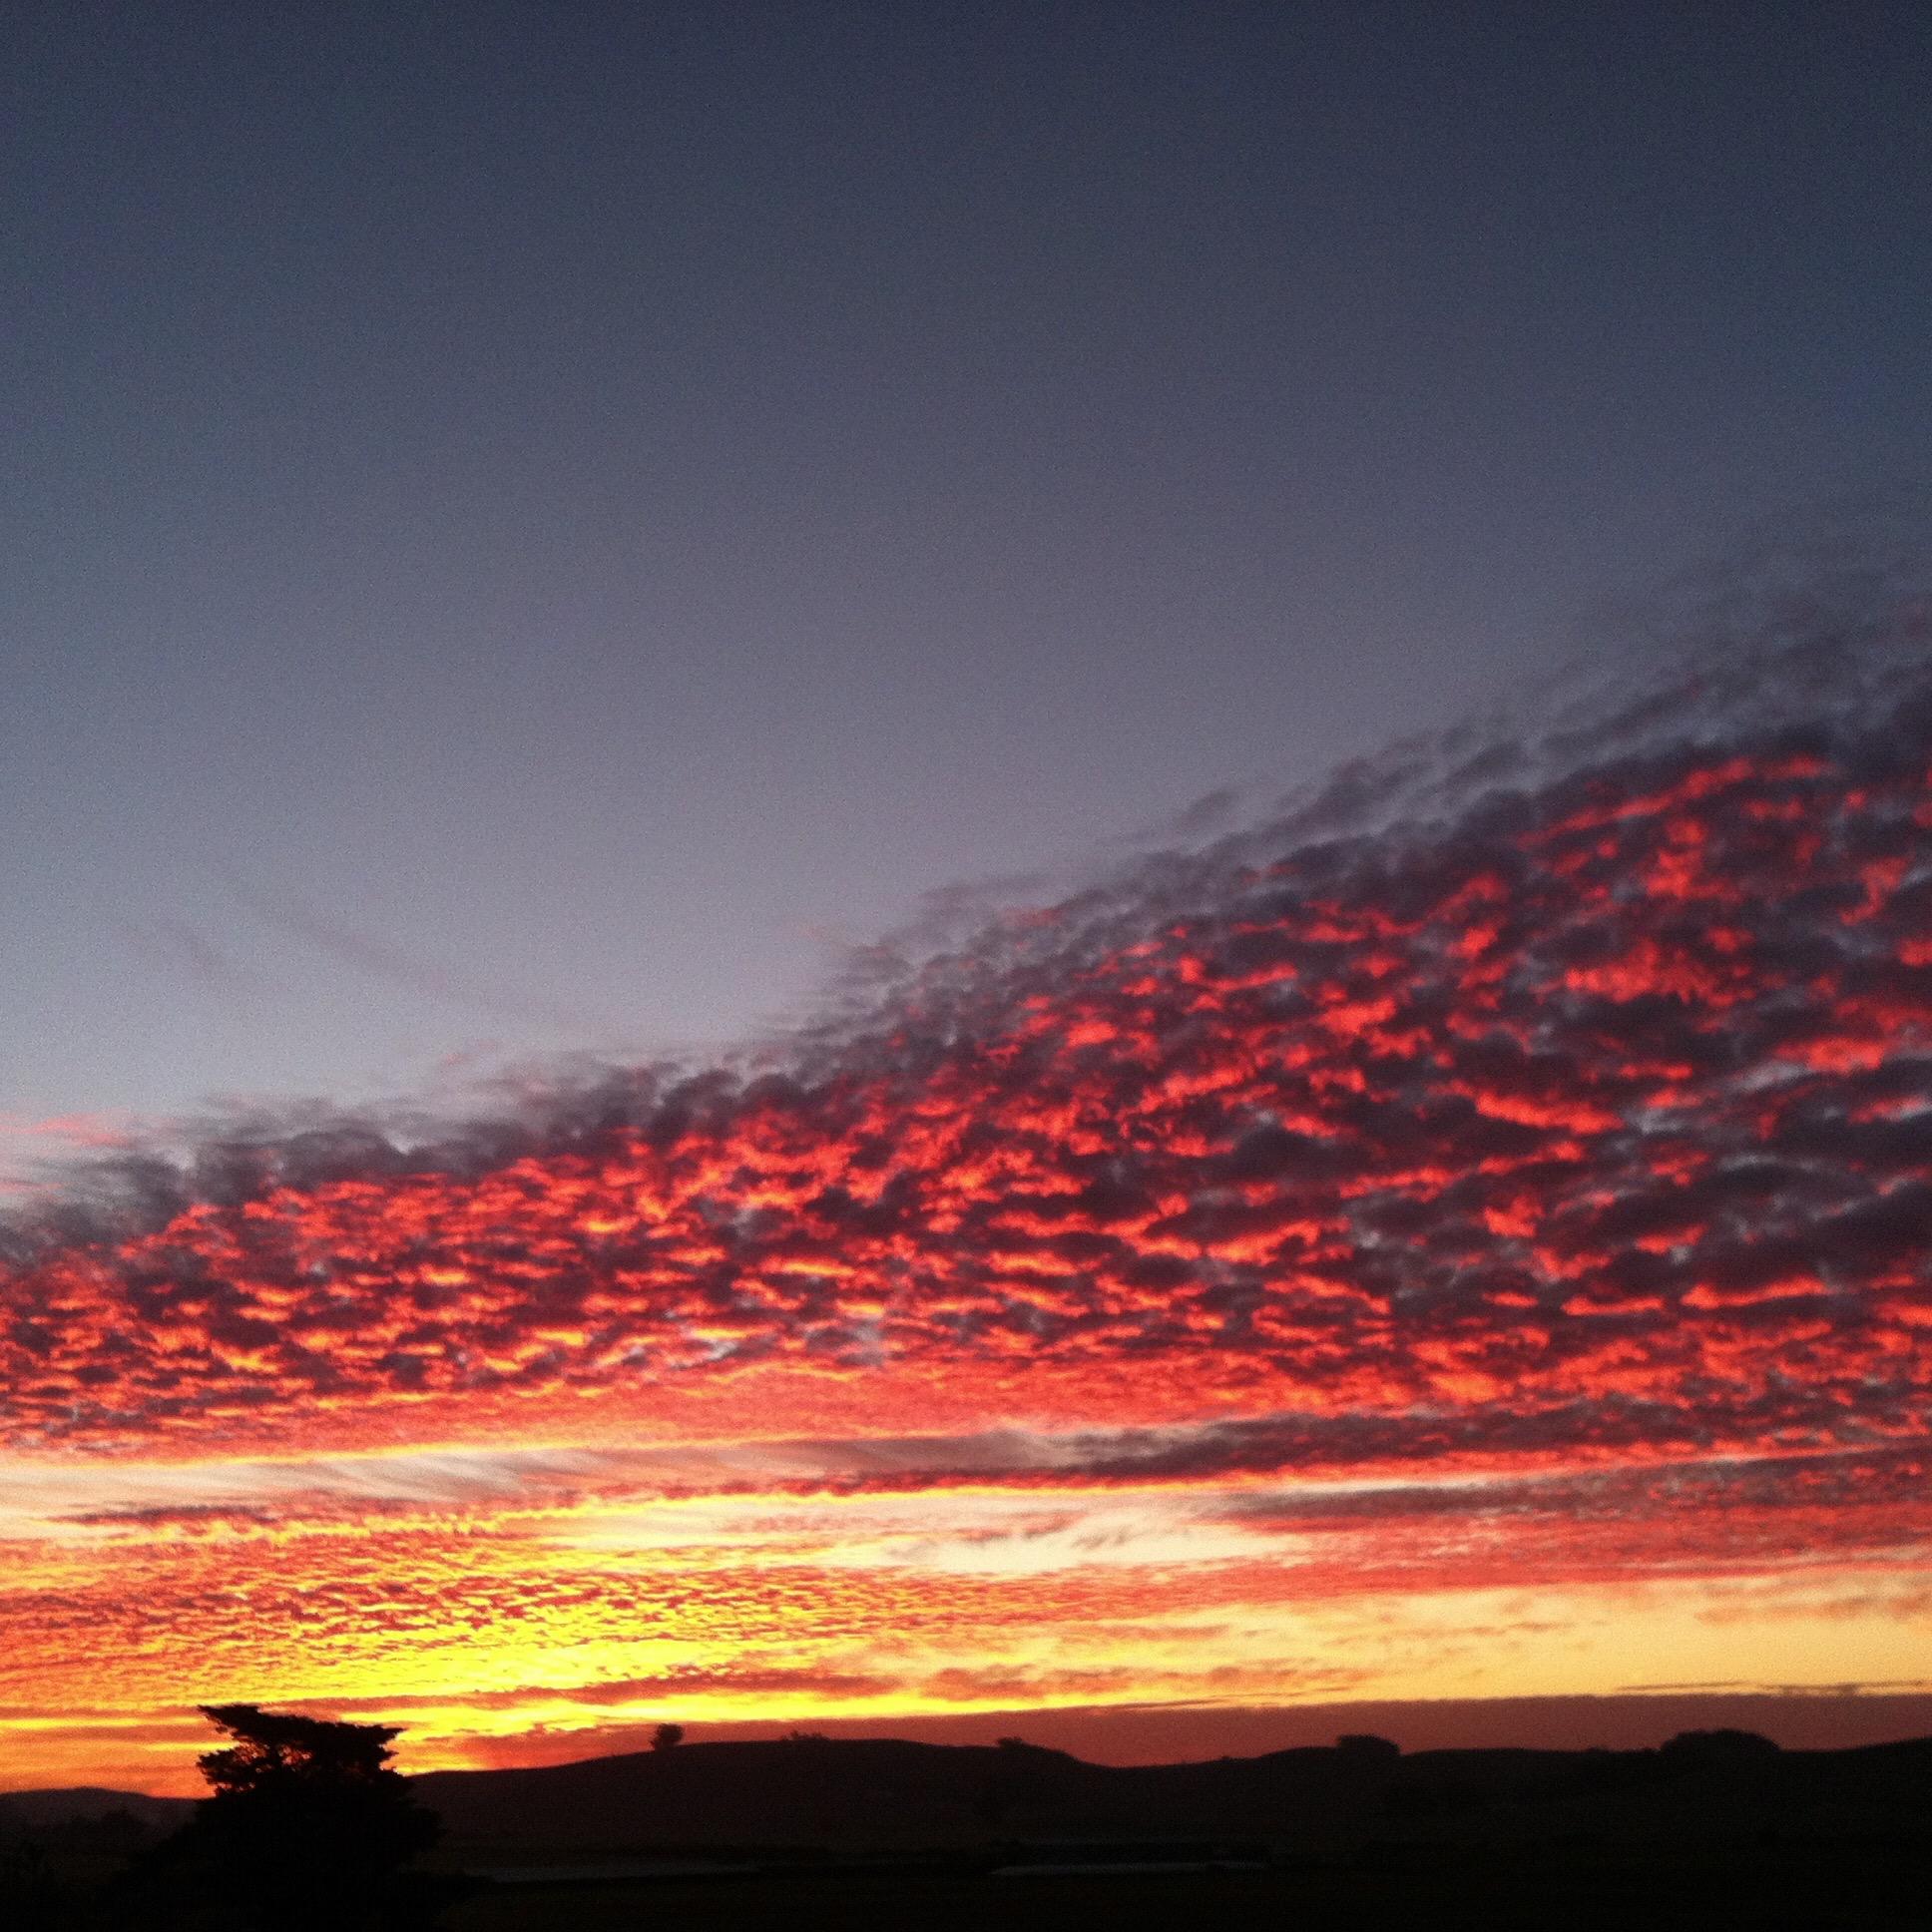 An Arizona desert at sunset (November 2015)